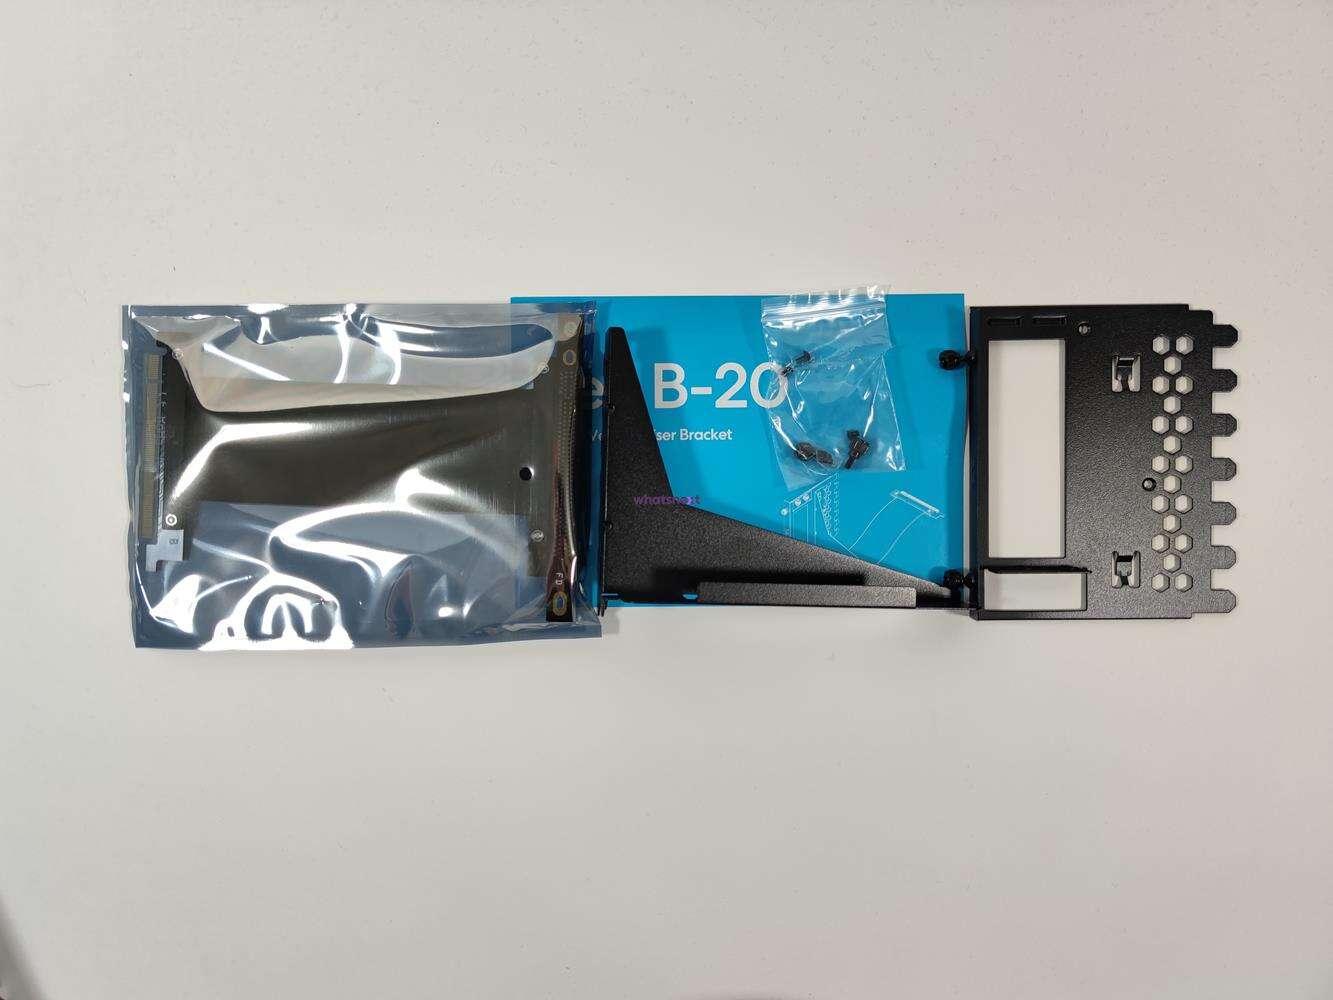 test Fractal Design Universal Multibrackets - Type A oraz risera Flex B-20, recenzja Fractal Design Universal Multibrackets - Type A oraz risera Flex B-20, opinia Fractal Design Universal Multibrackets - Type A oraz risera Flex B-20